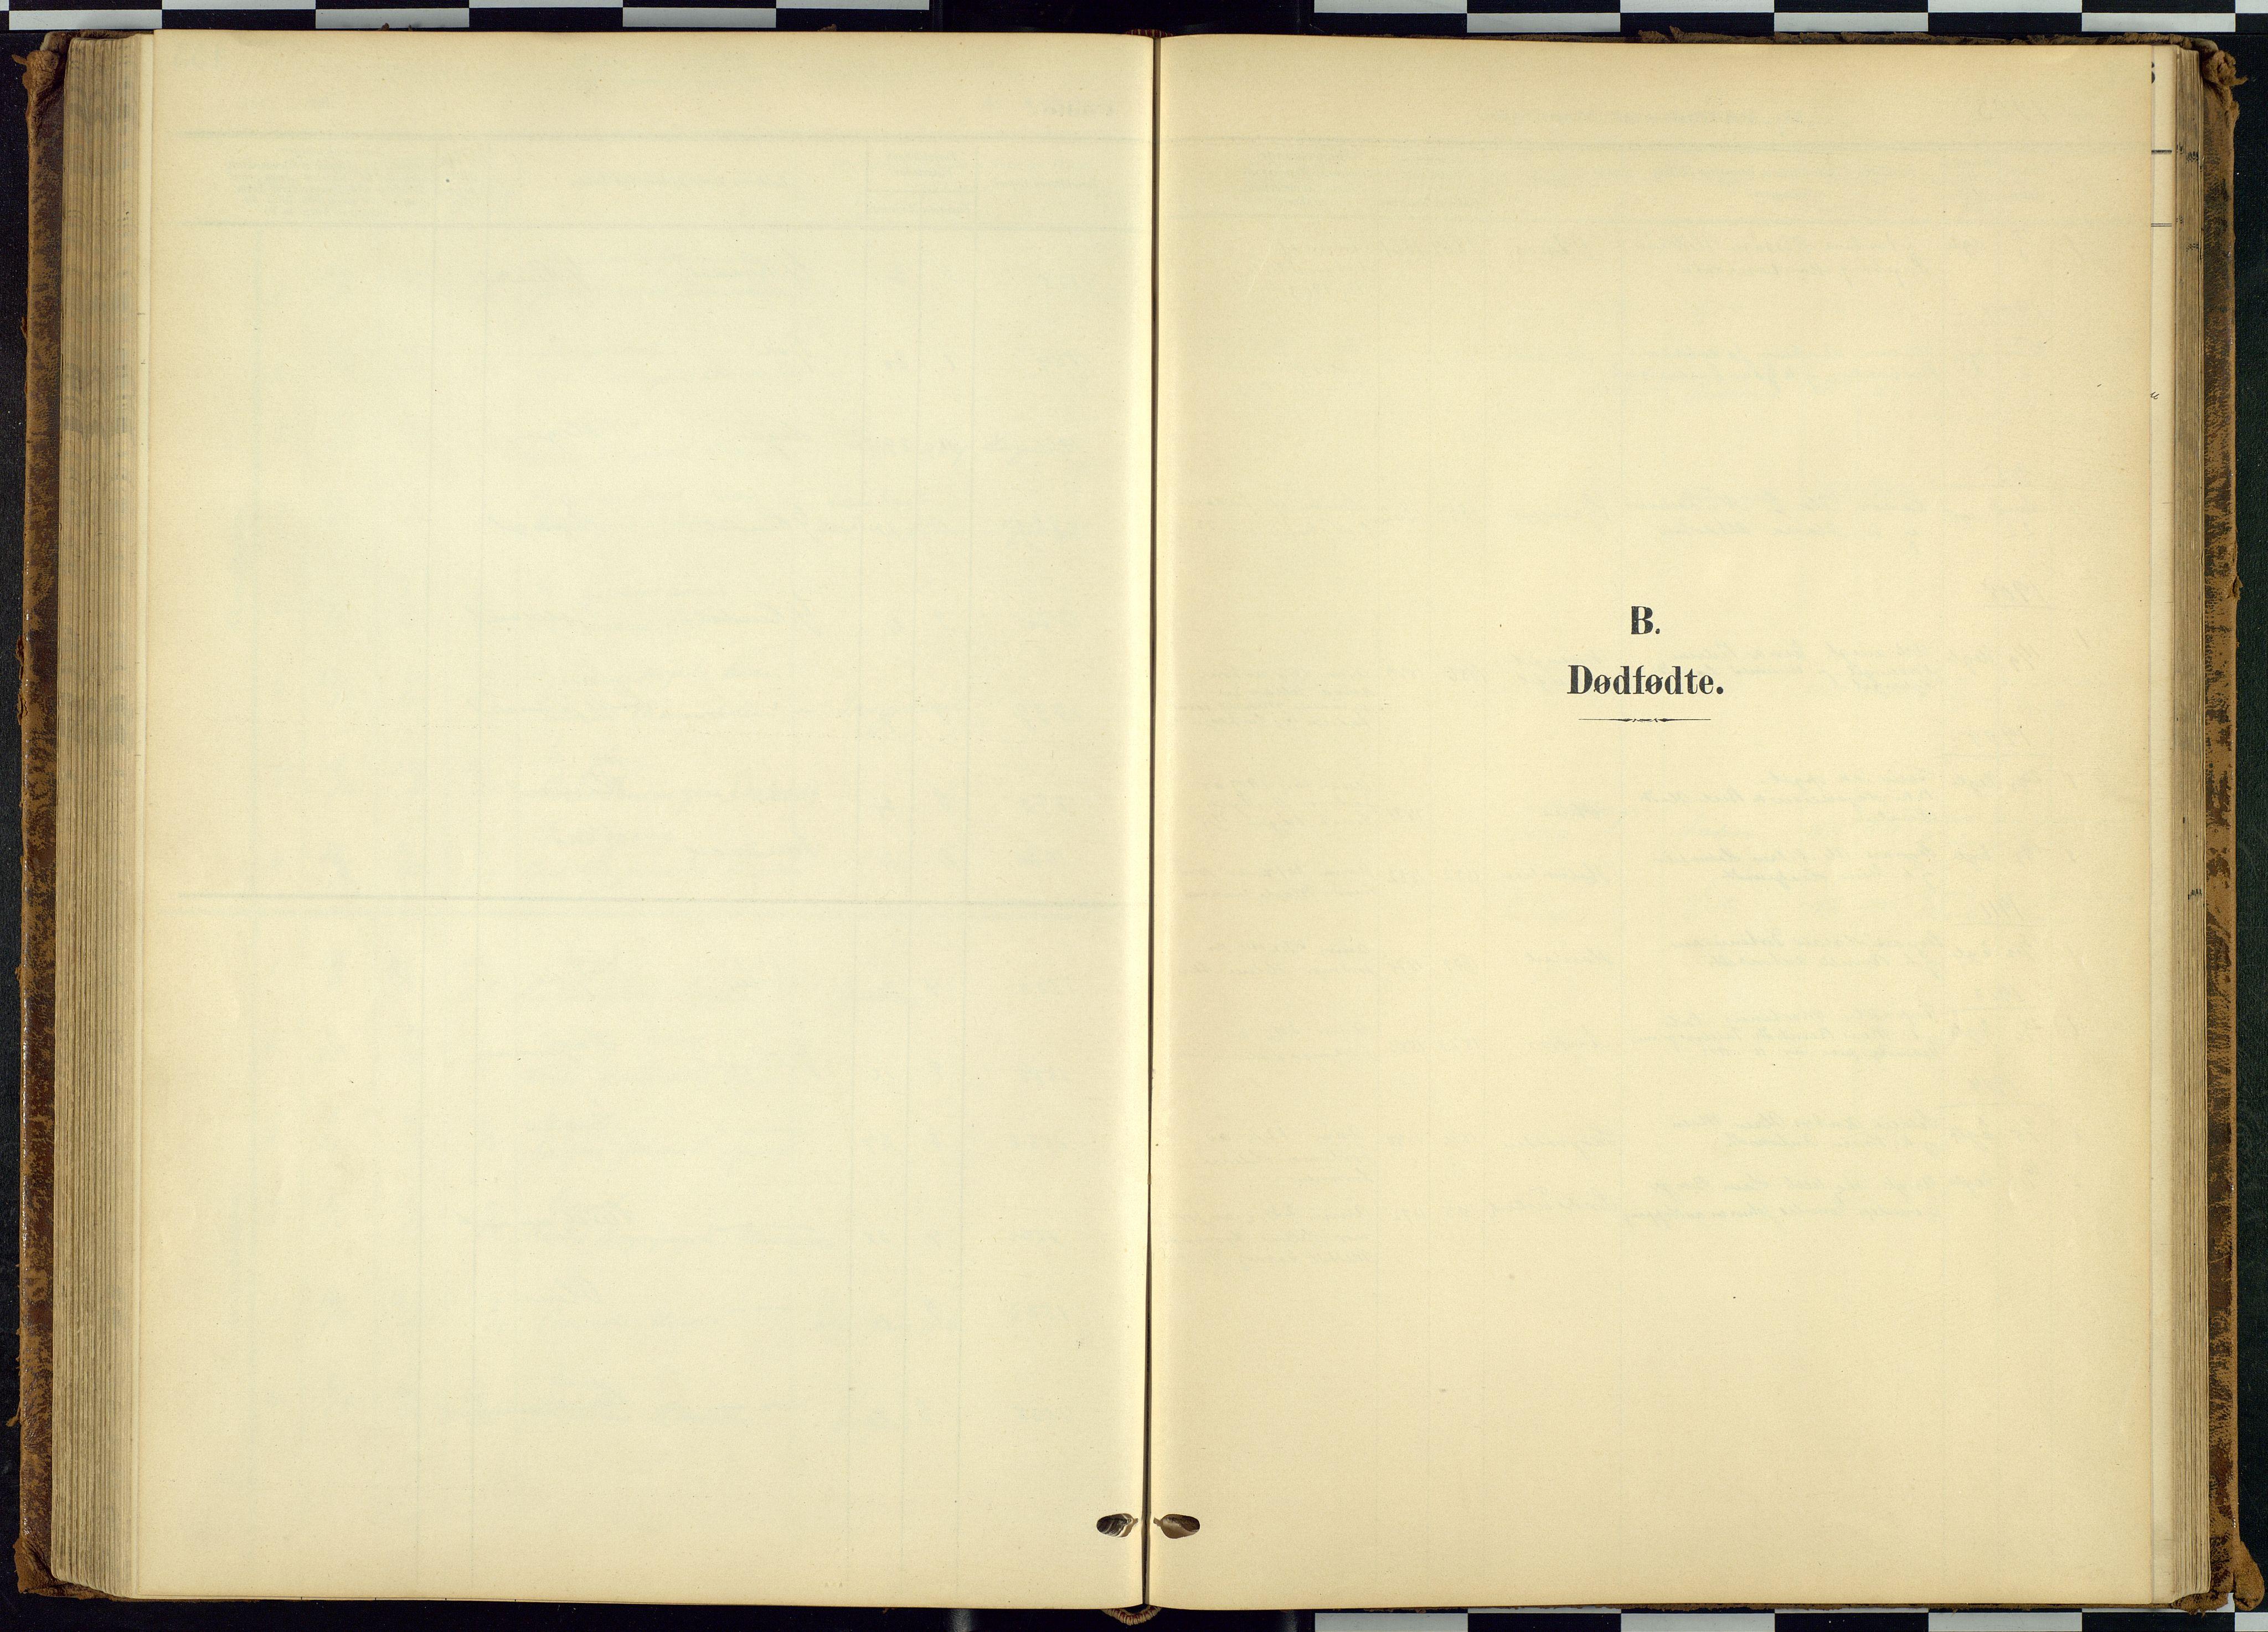 SAH, Rendalen prestekontor, H/Ha/Hab/L0010: Parish register (copy) no. 10, 1903-1940, p. 156